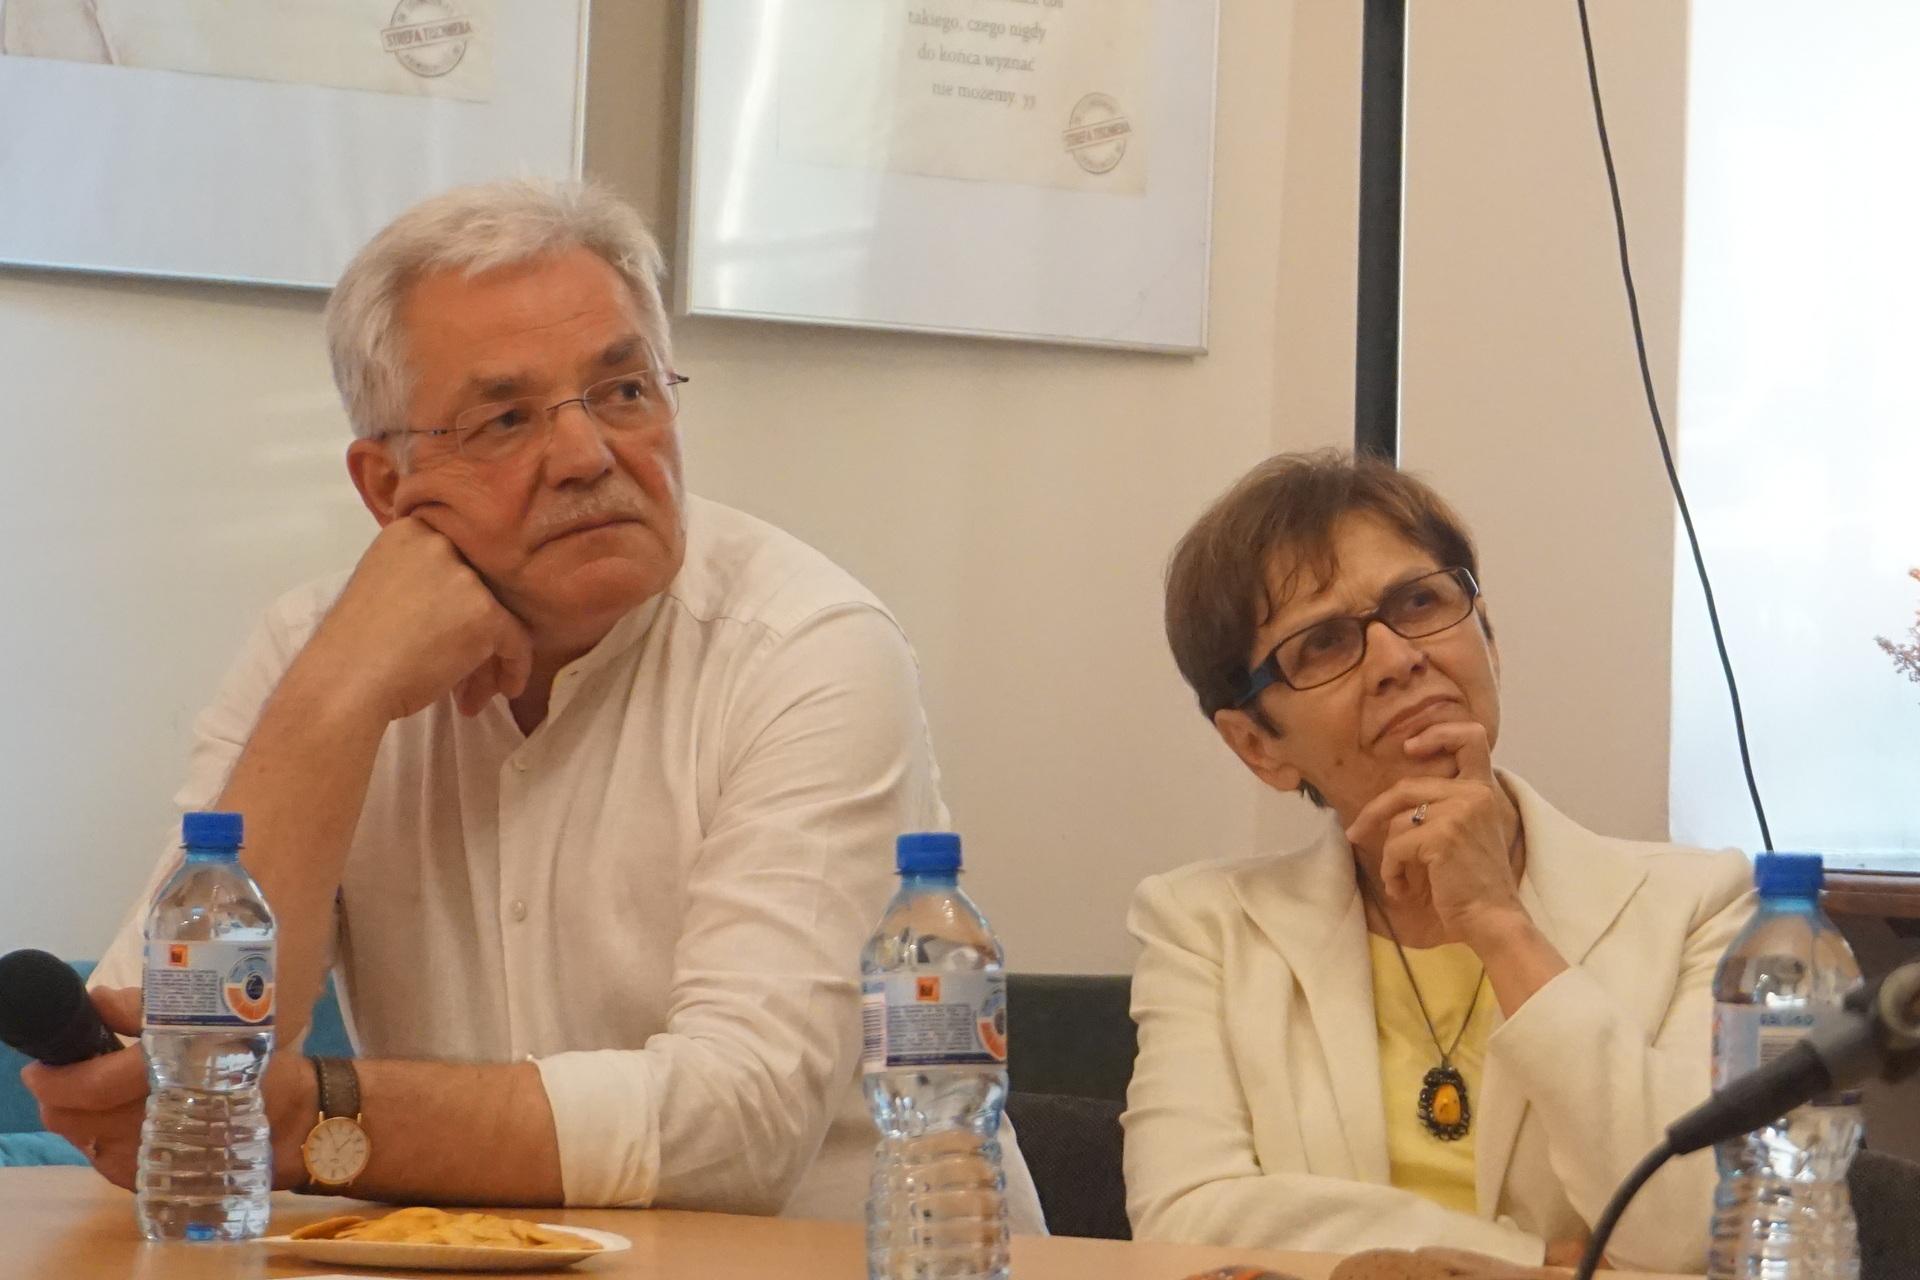 Stanisław Kracik i Jadwiga Konarzewska-Kracik